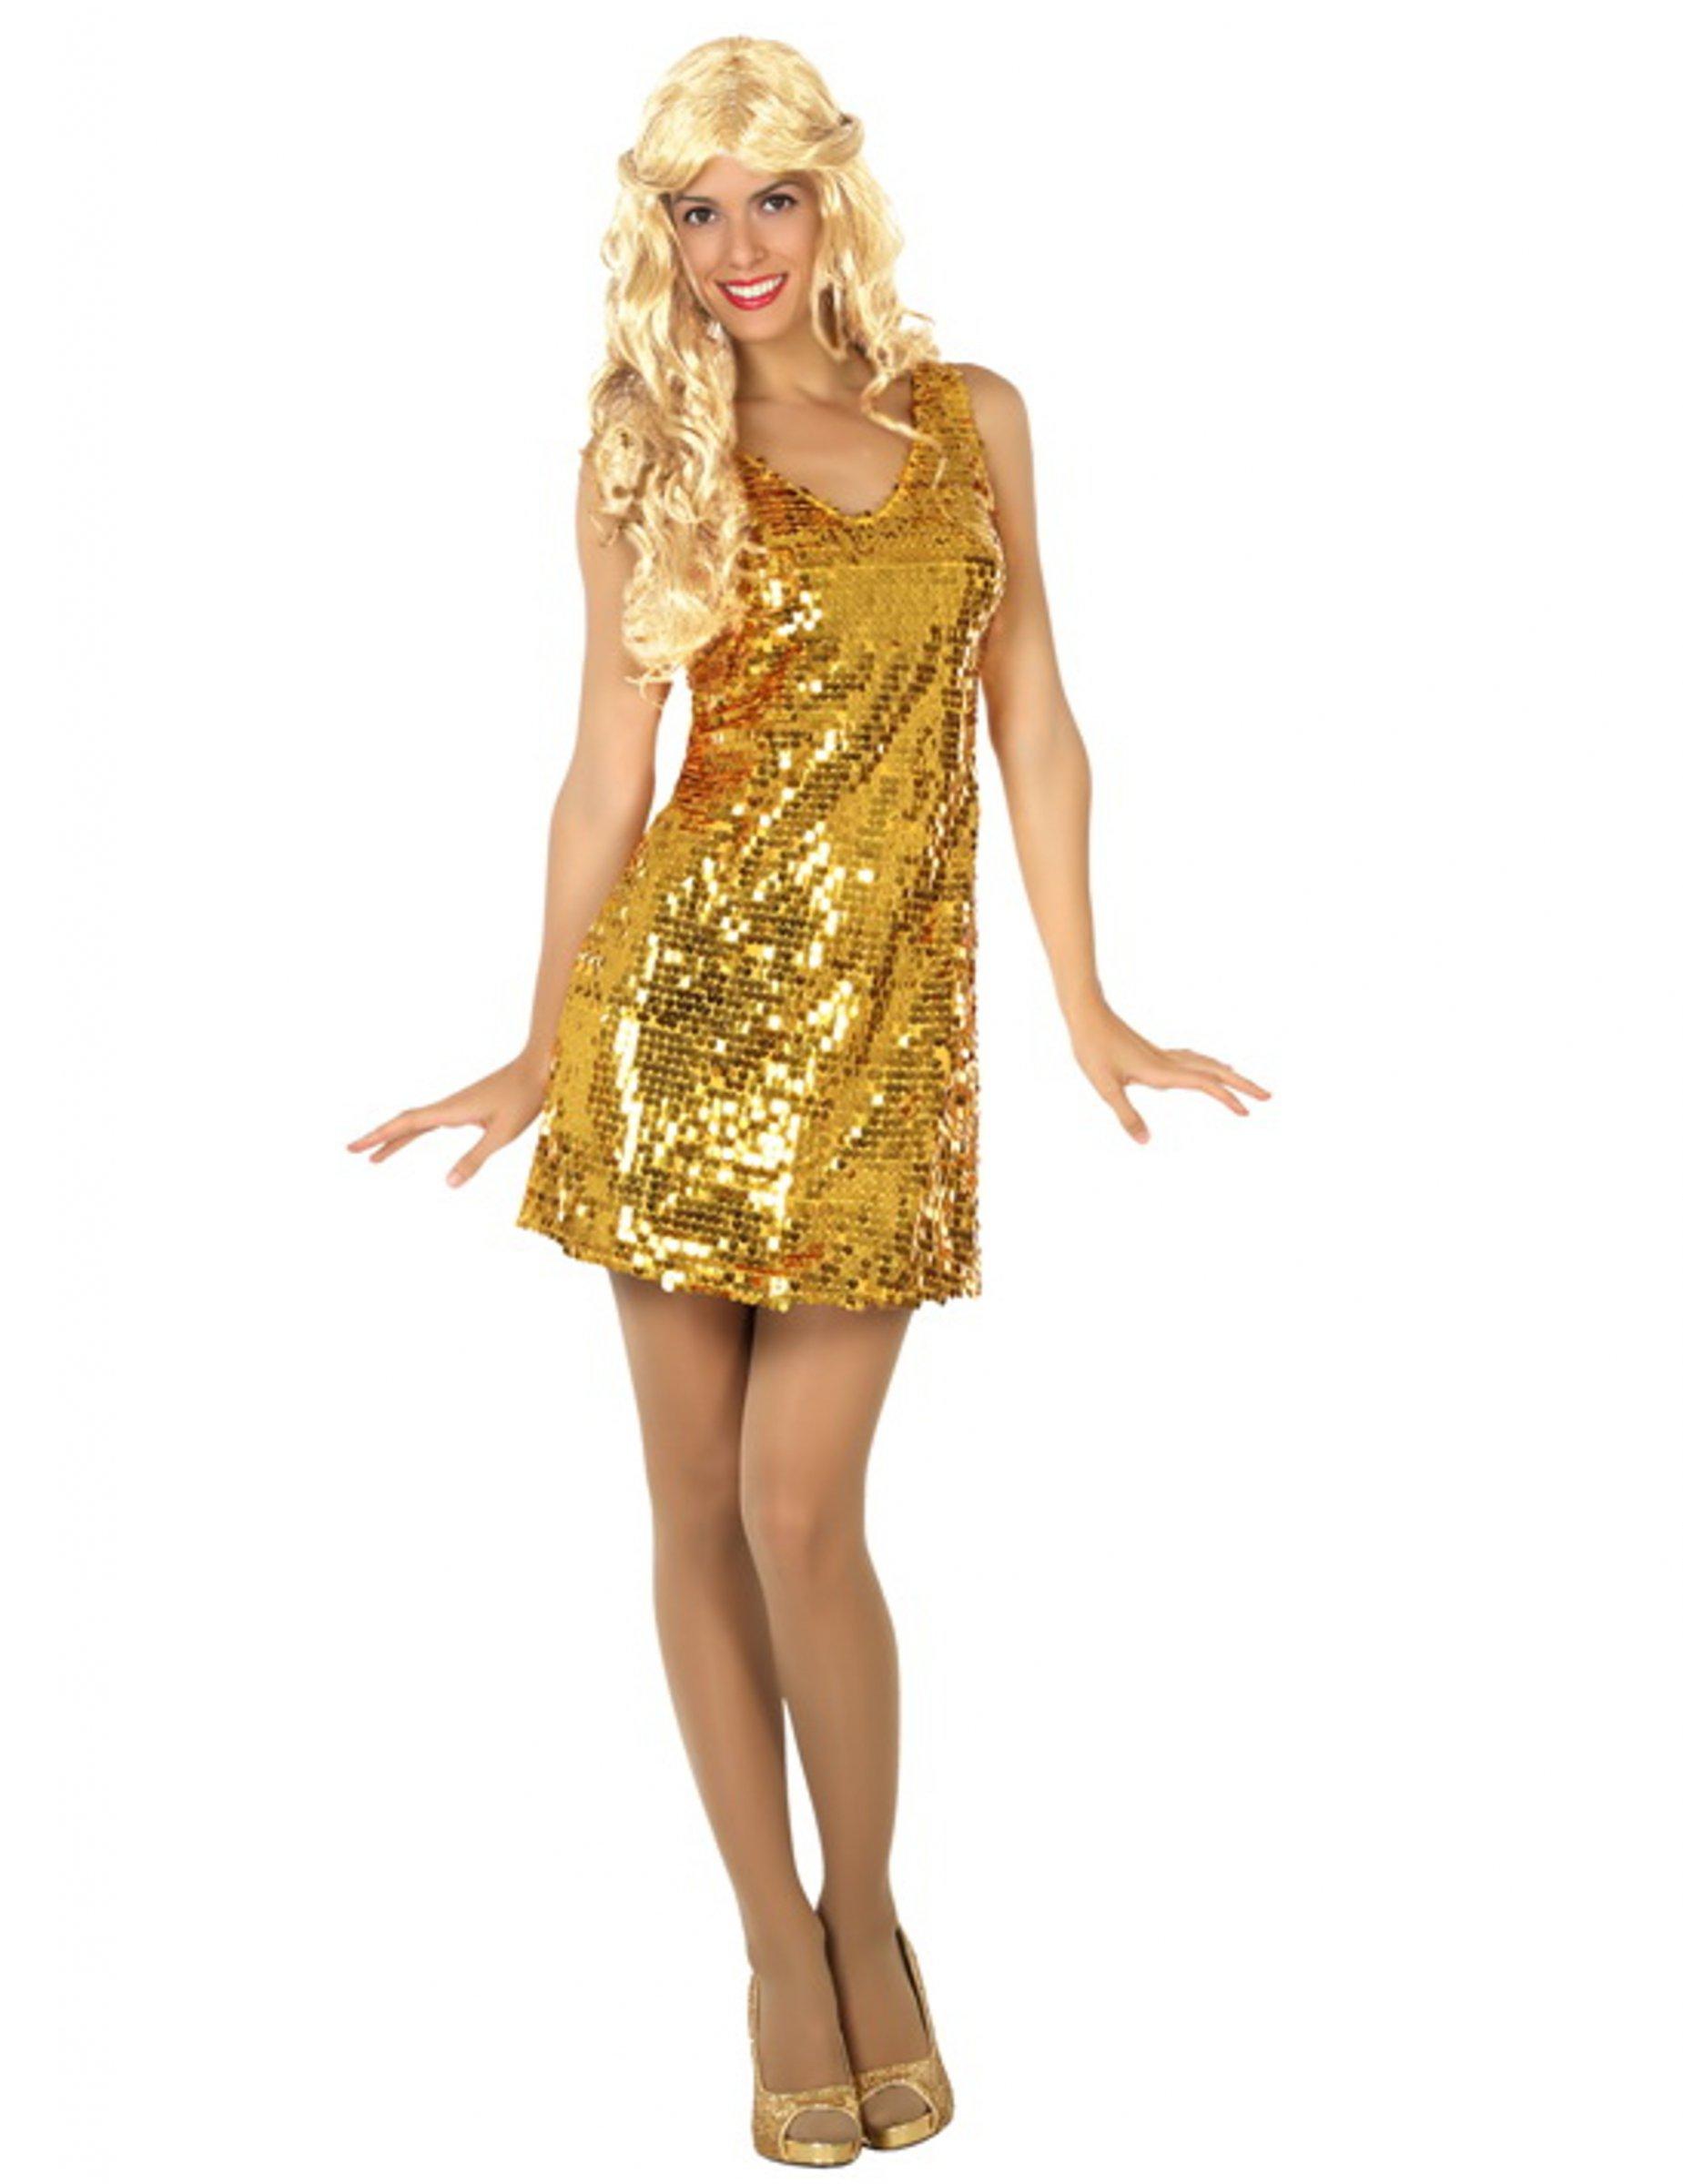 d guisement robe disco sexy or femme deguise toi achat de d guisements adultes. Black Bedroom Furniture Sets. Home Design Ideas